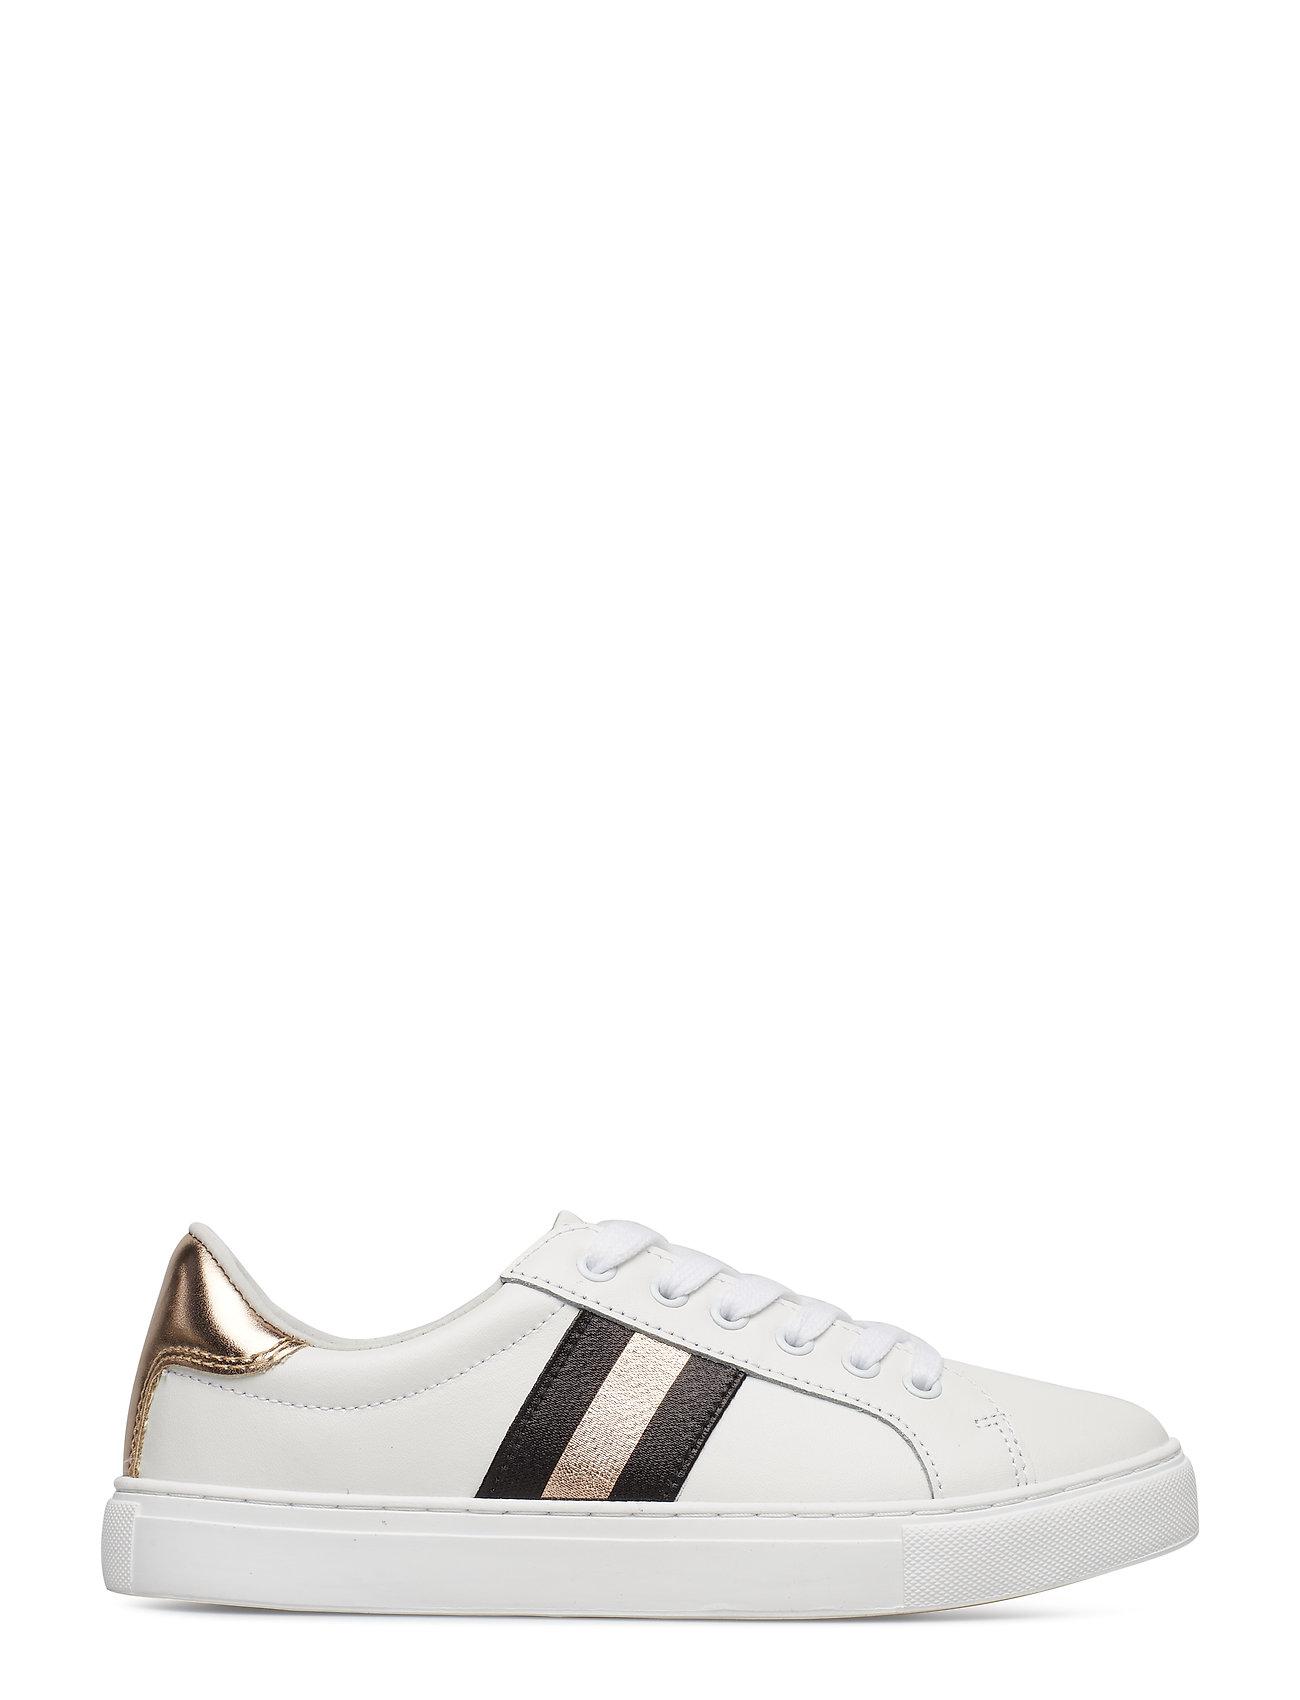 2ec264b29b4 Sofie Schnoor sneakers – Sneaker Elastic til dame i Hvid - Pashion.dk